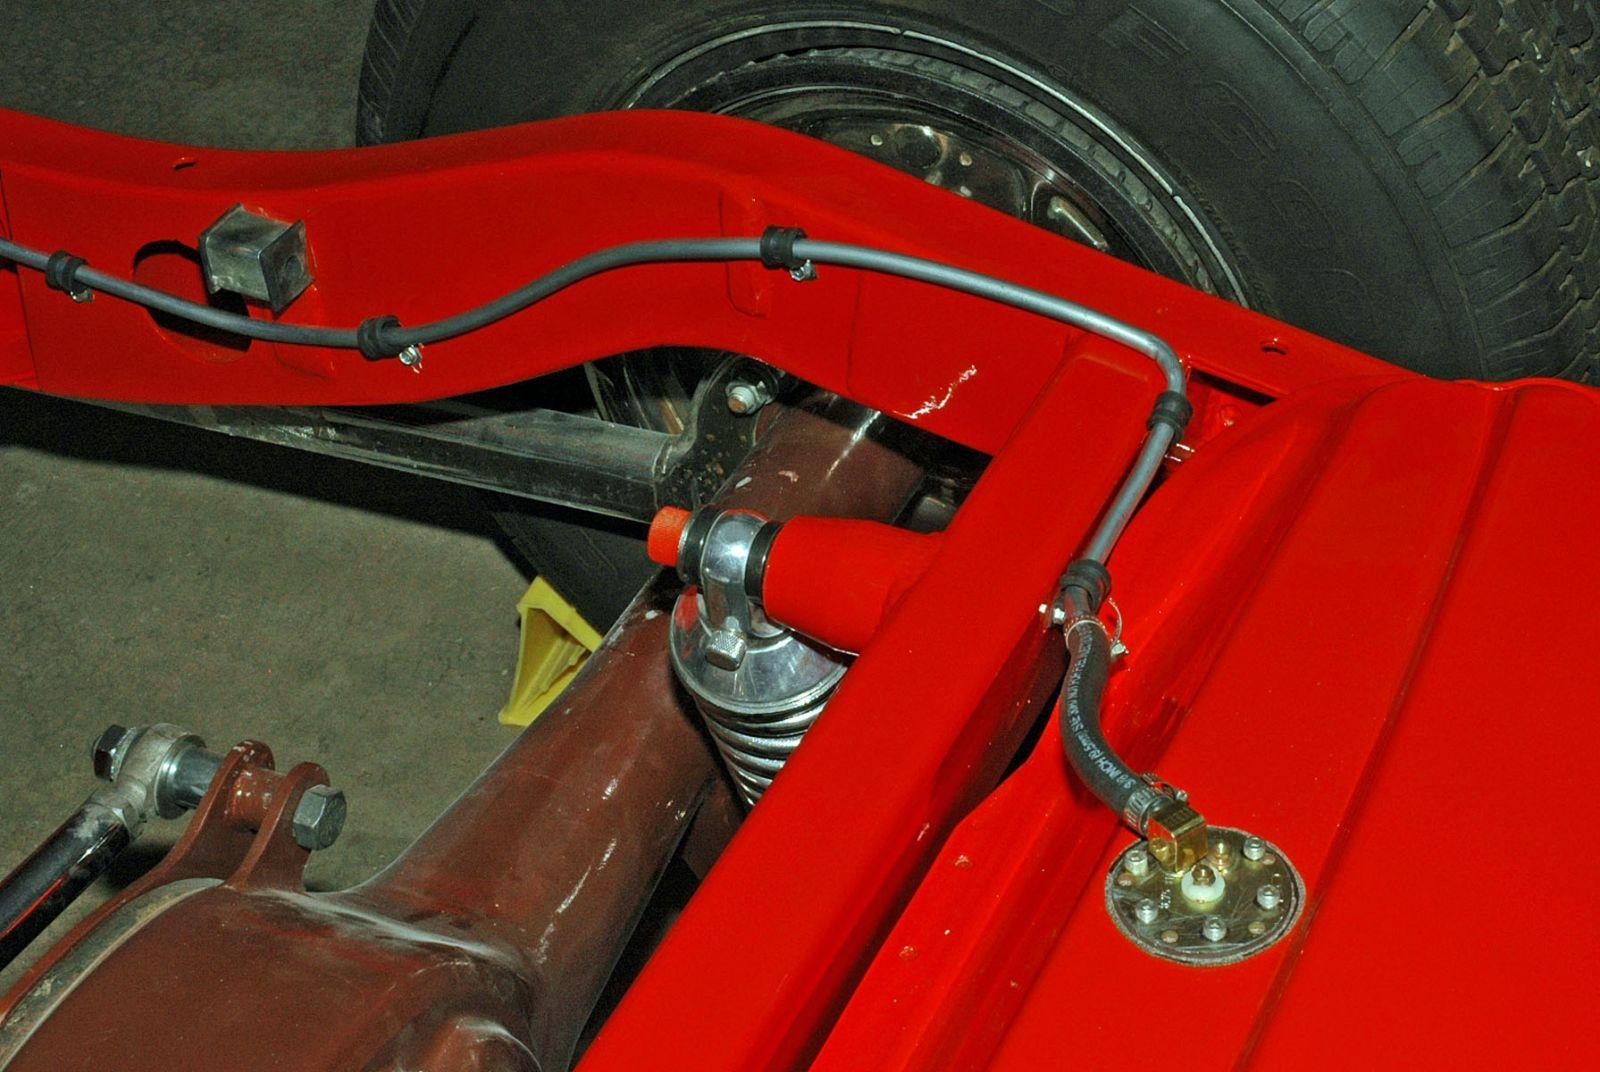 1966 Bug Wiring Diagram Schematic Installing A Fuel Gauge And Sender Hotrod Hotline